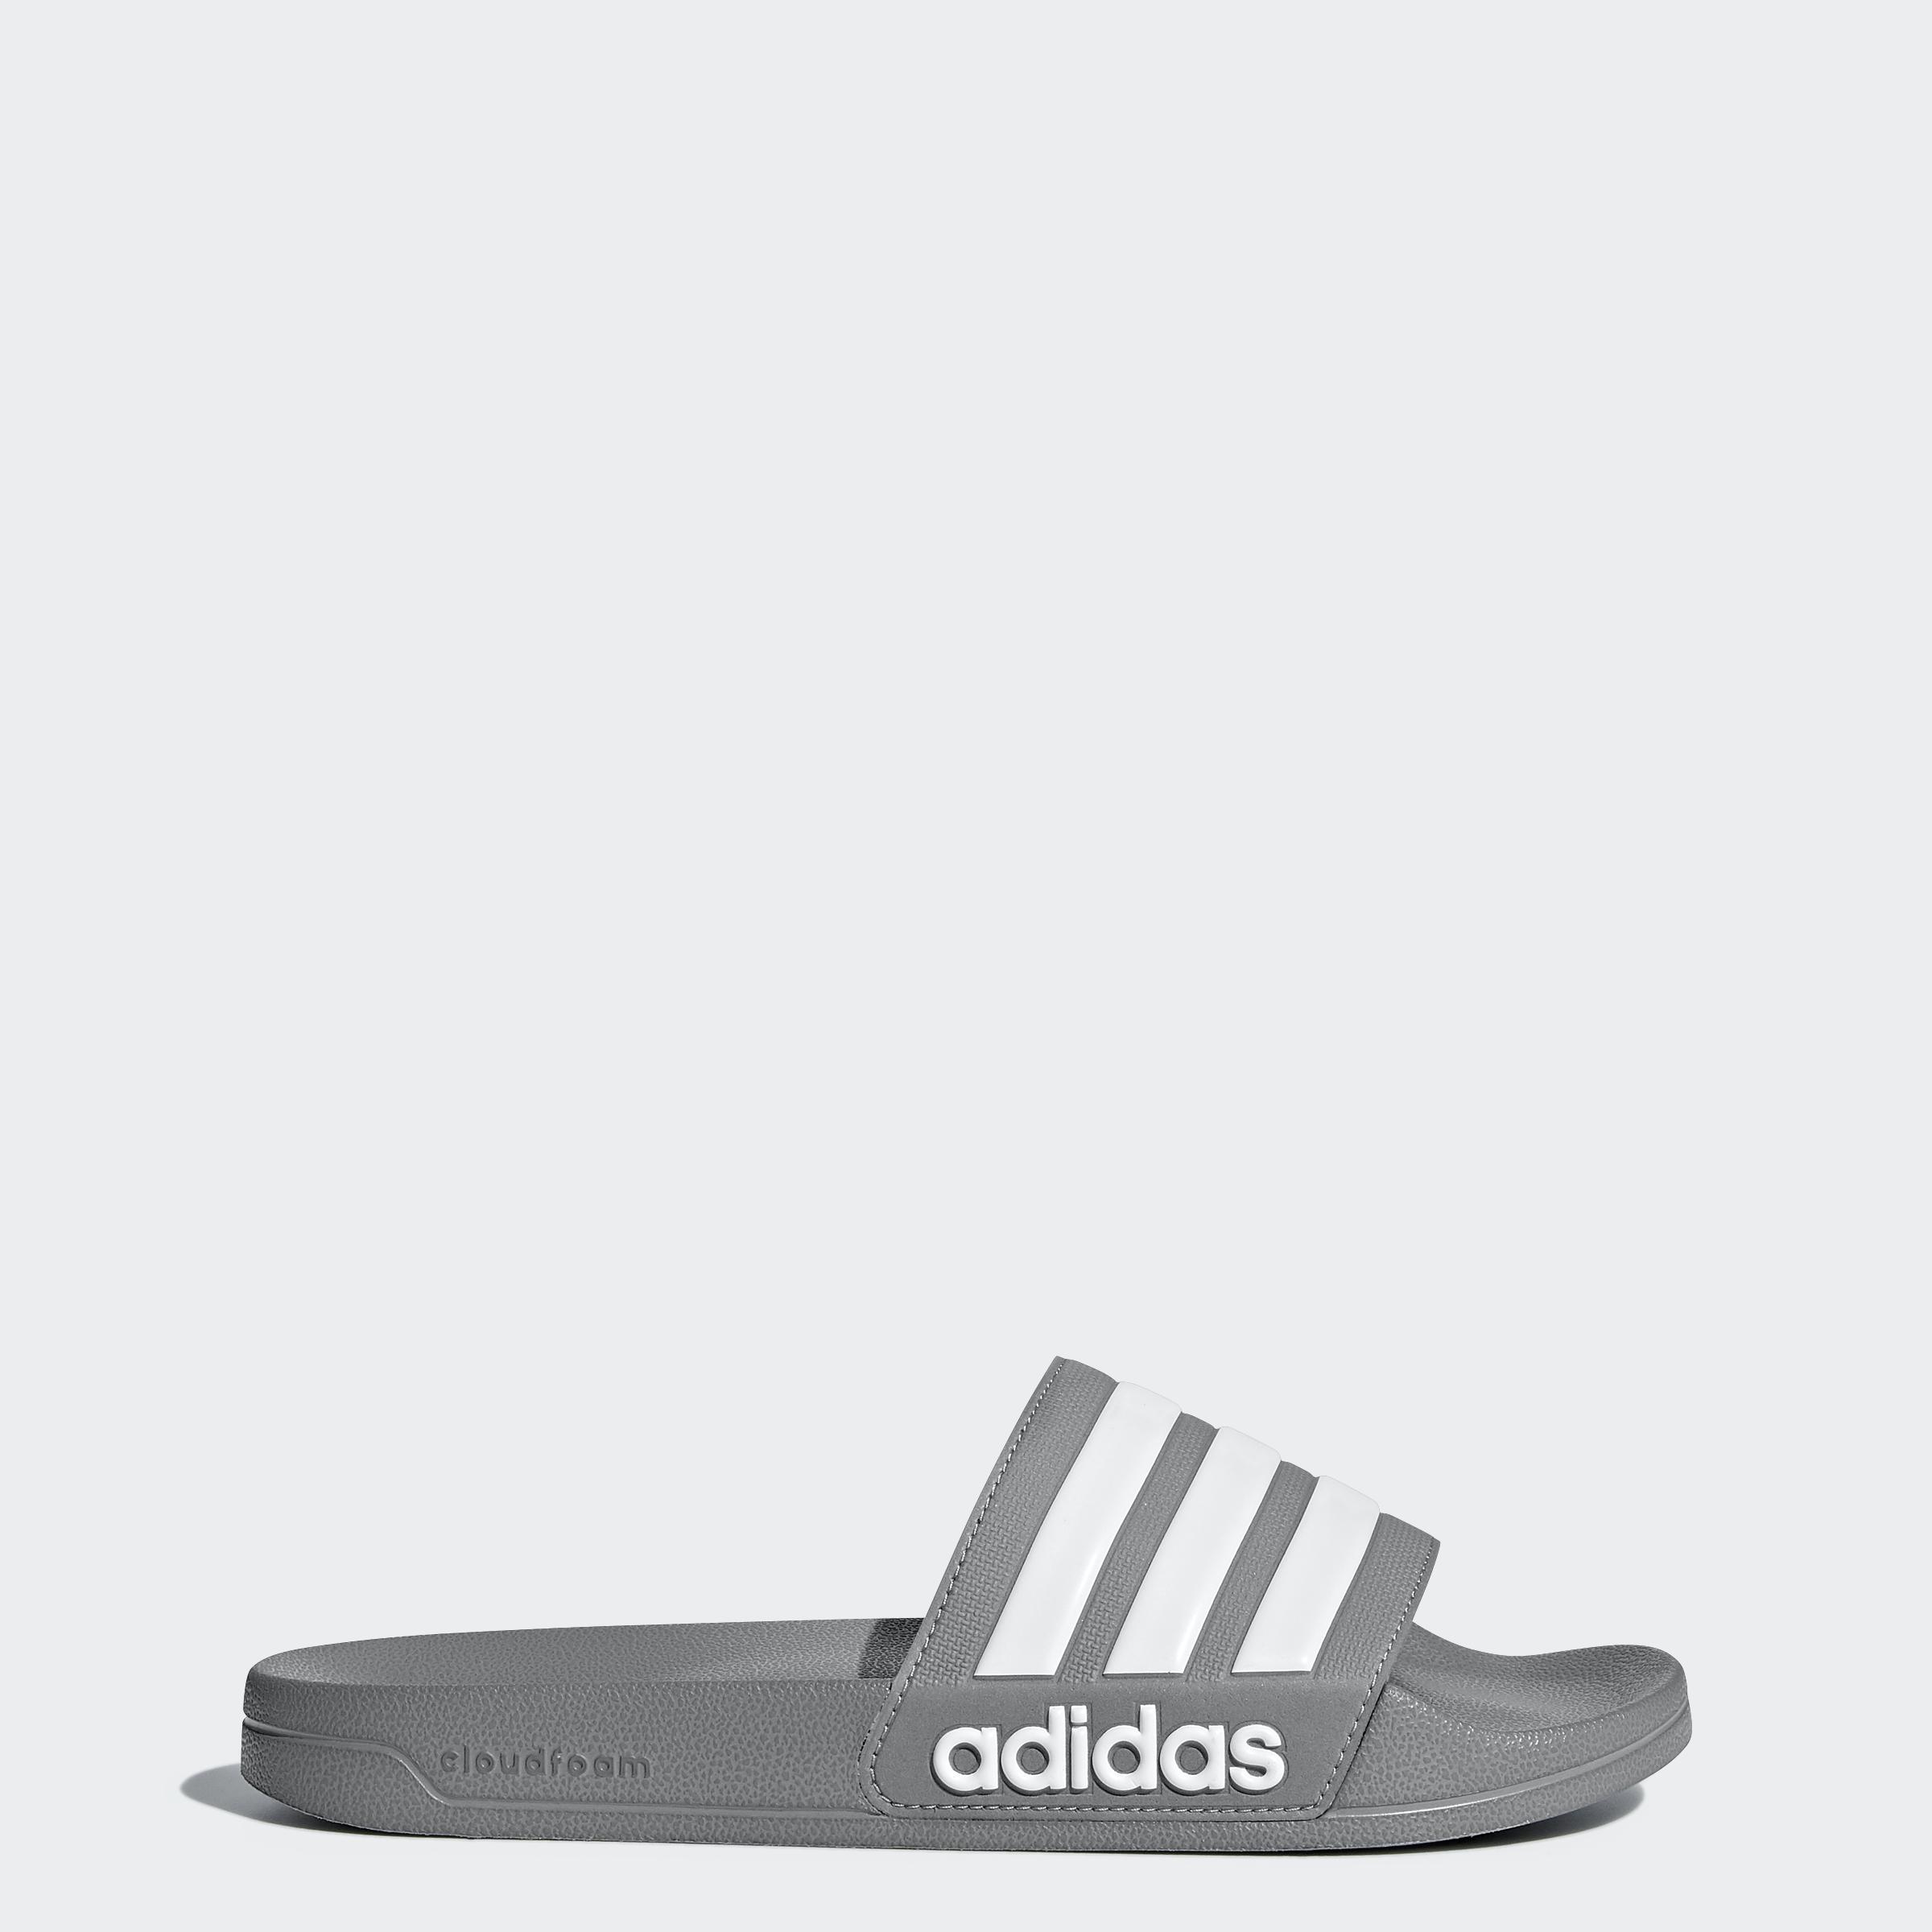 adidas-Adilette-Cloudfoam-Slides-Men-039-s thumbnail 34